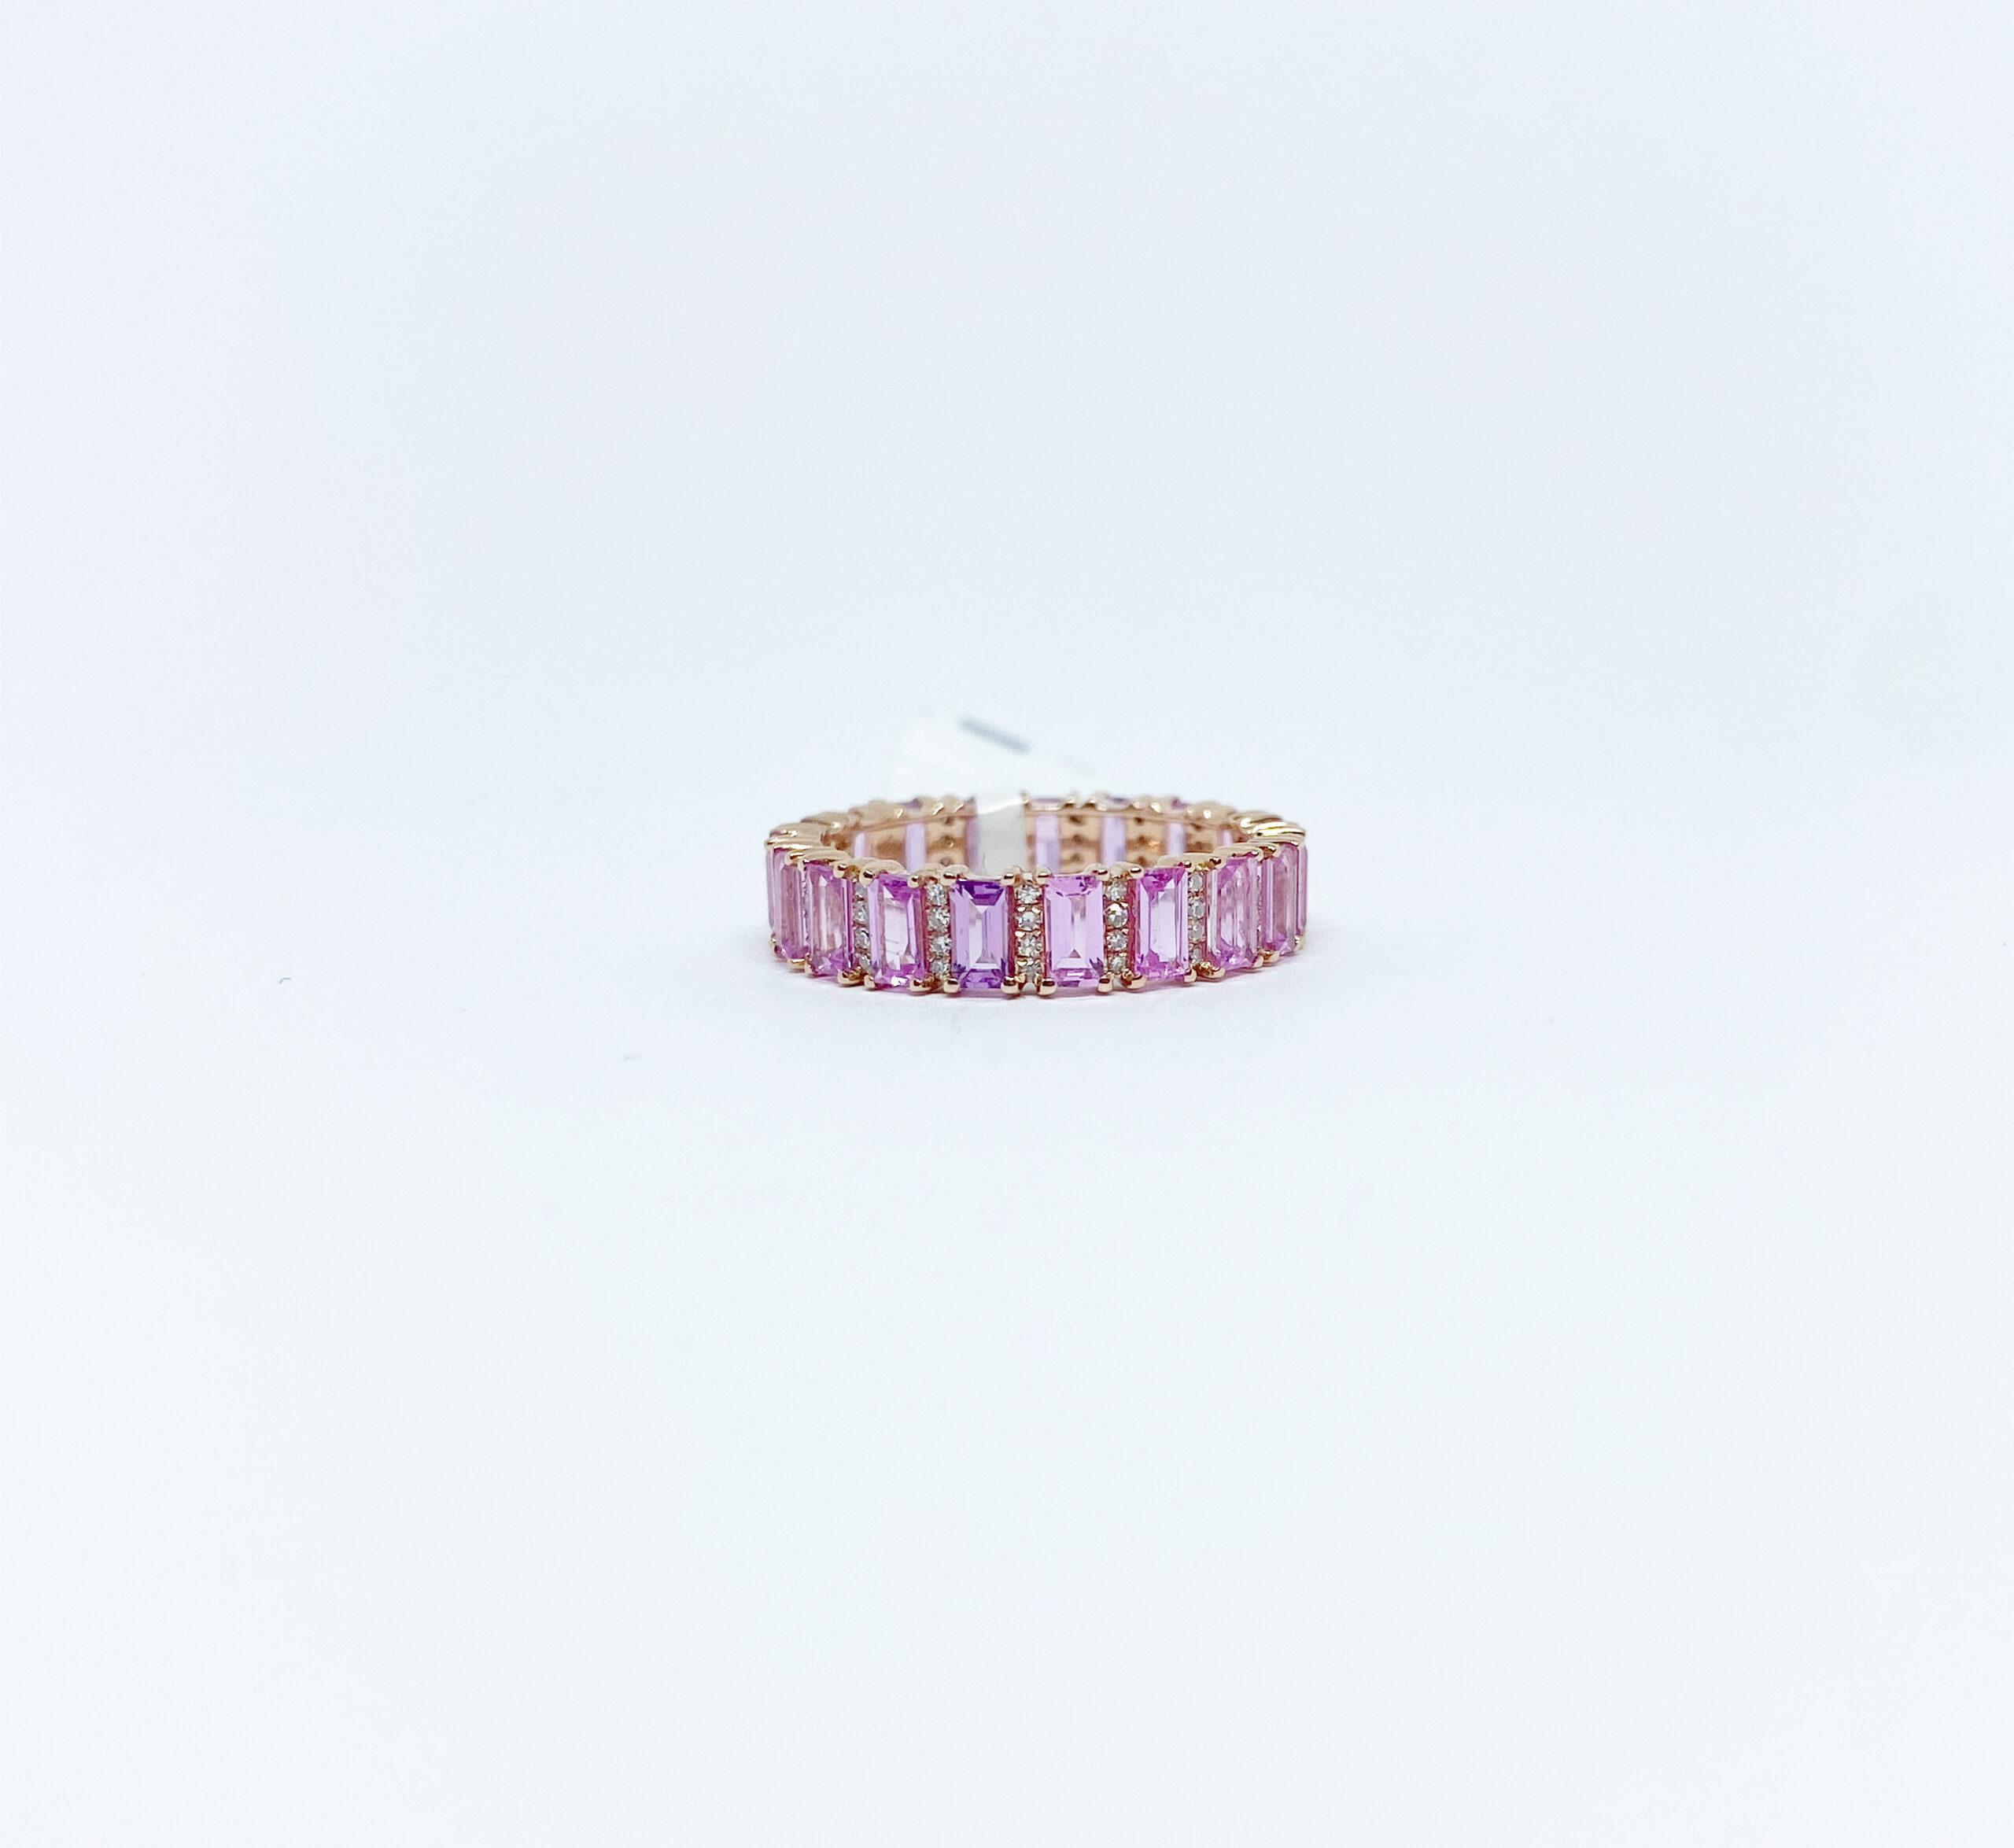 Anillo Completo de Zafiro Rosa con Diamantes